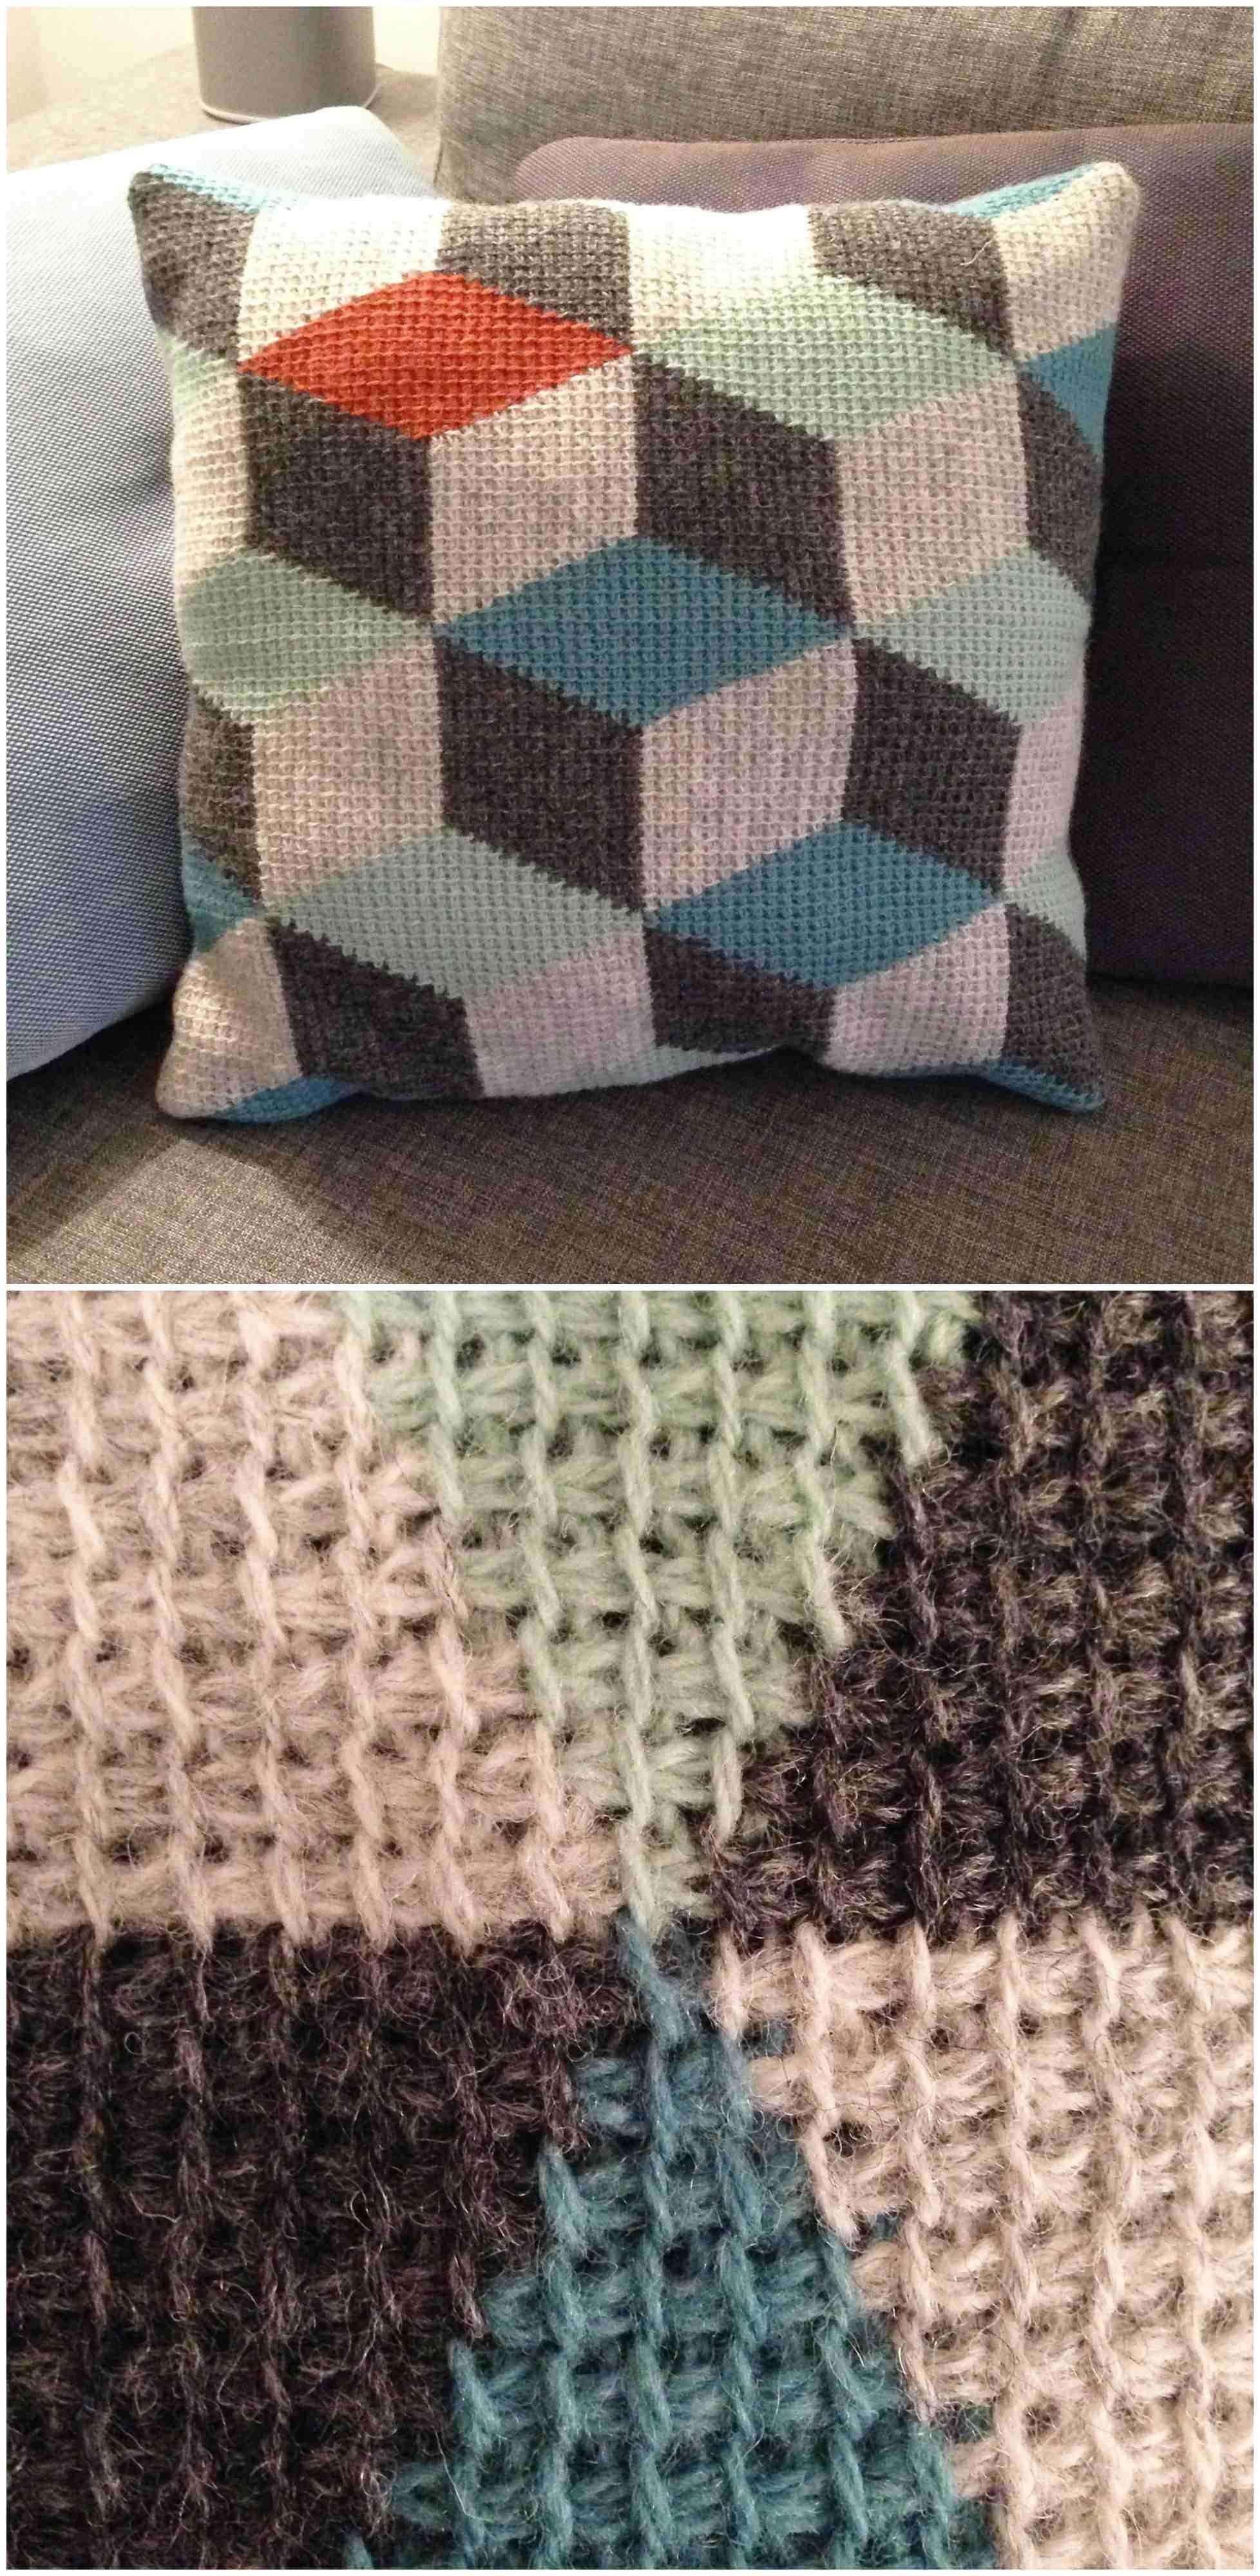 Tunisian crochet pillow 3D blocks – Craft Ideas #tunisiancrochet